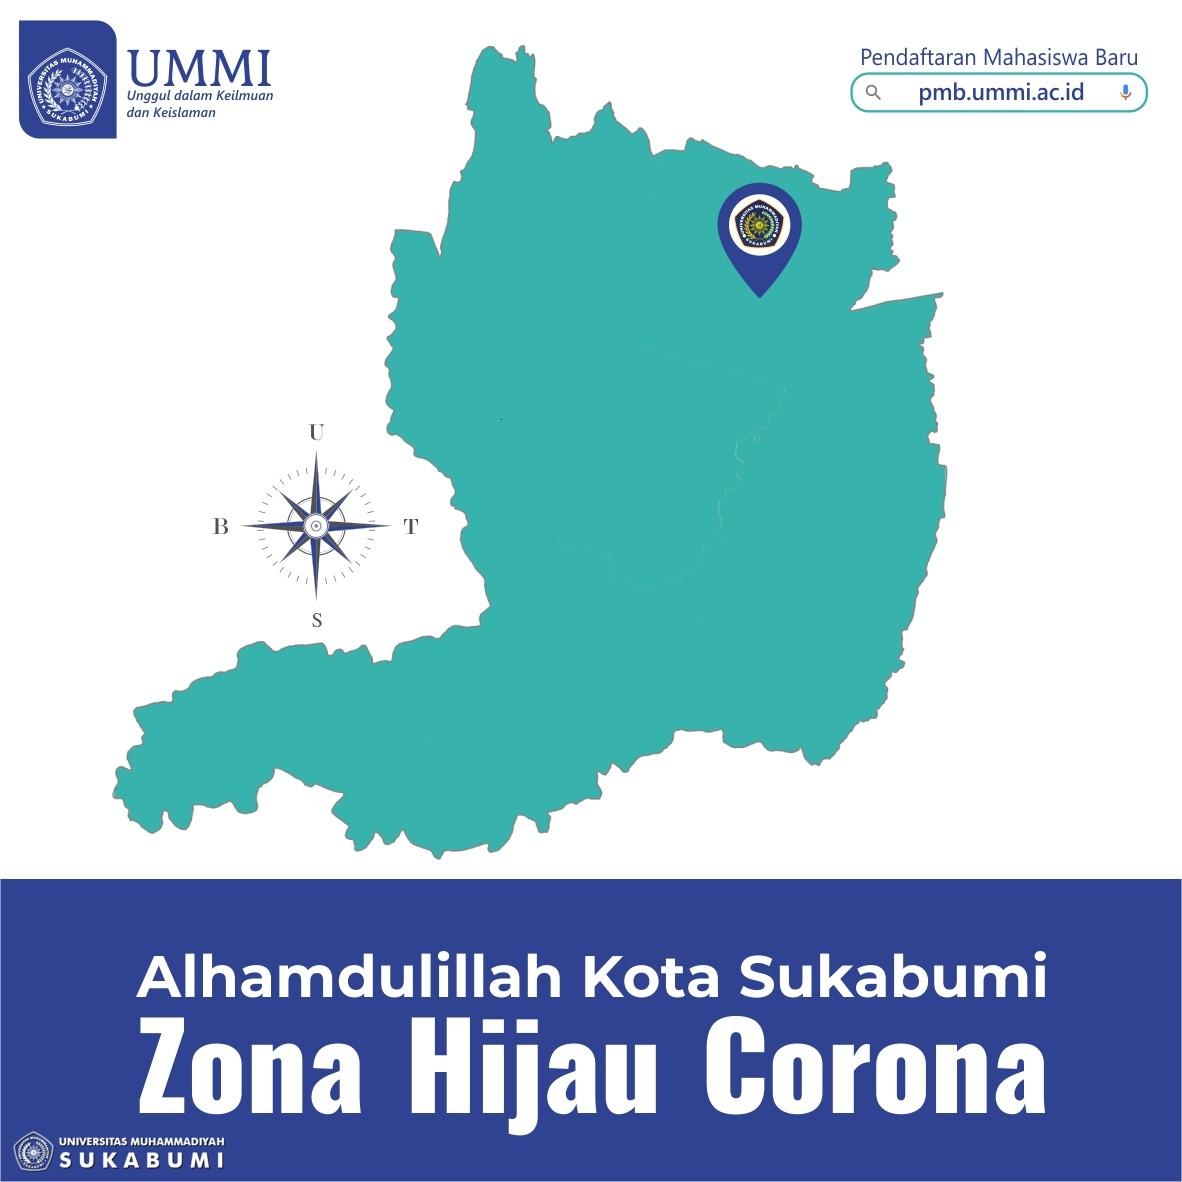 Alhamdulillah Kota Sukabumi   Zona Hijau Corona